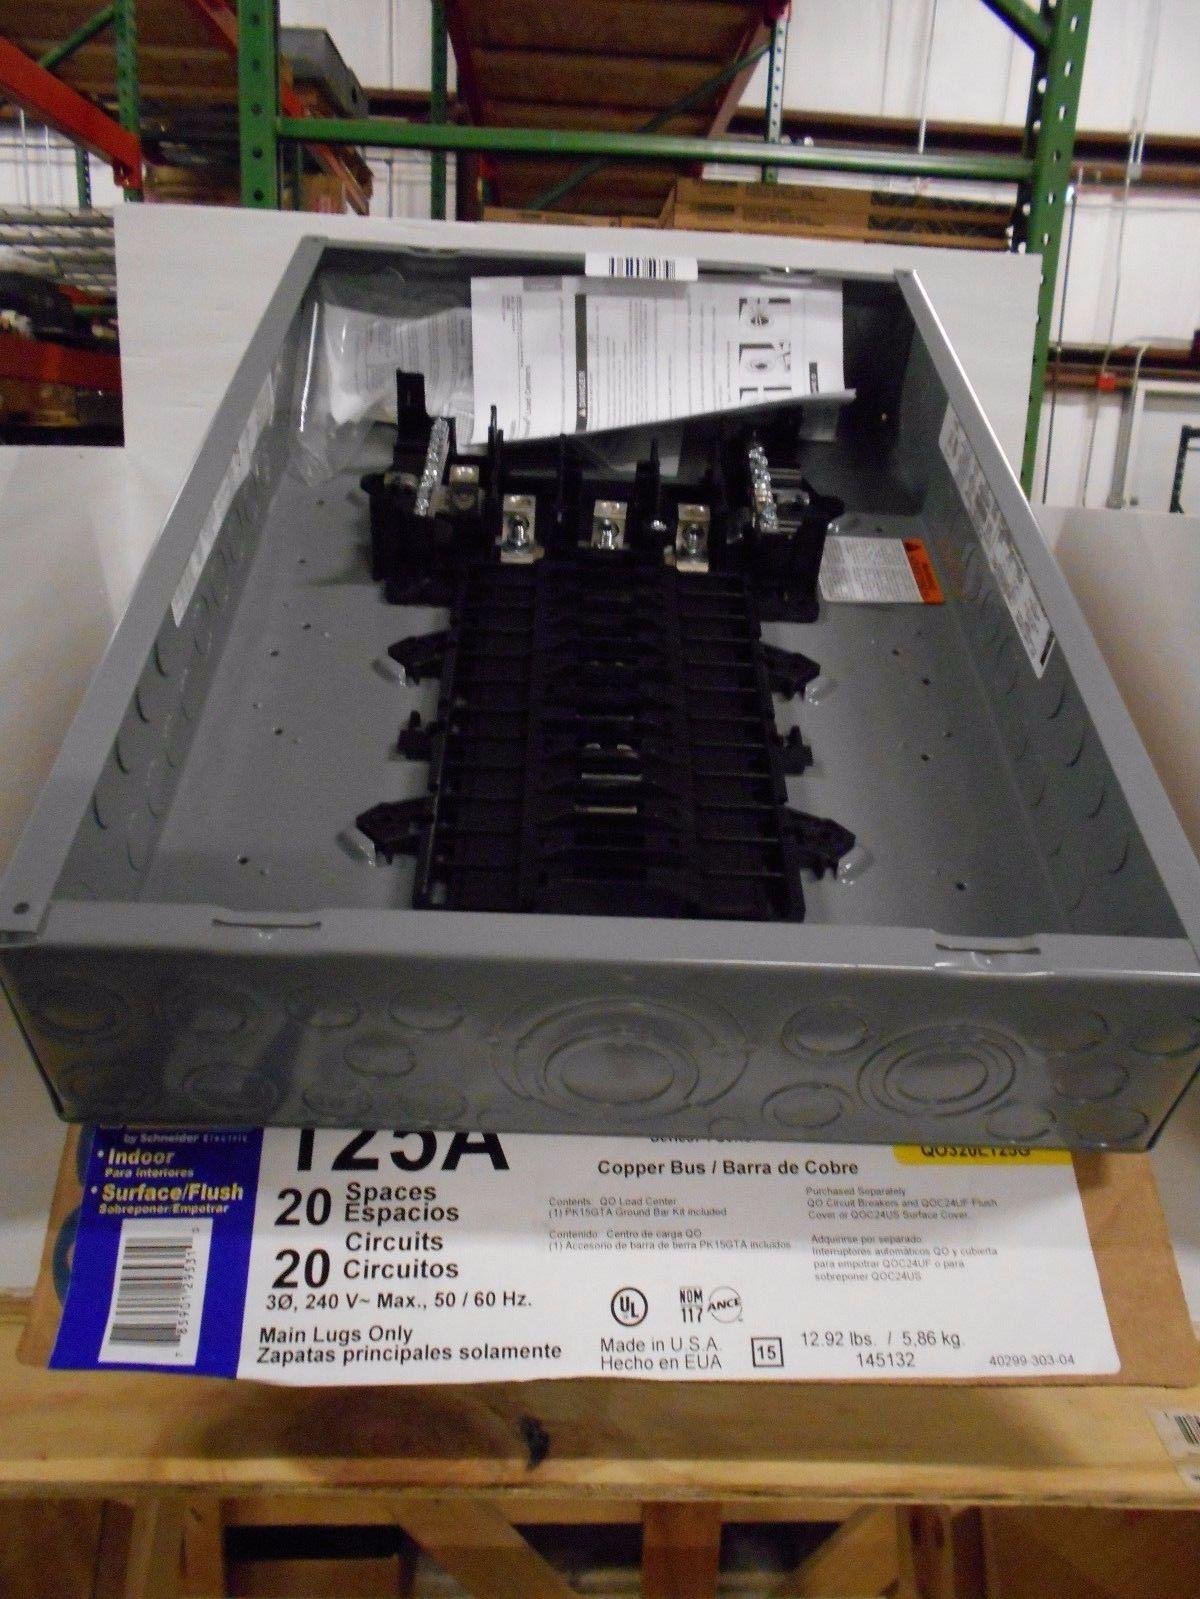 Square D Homeline 50 Amp 2space 4circuit Spa Panel Main Lug Load